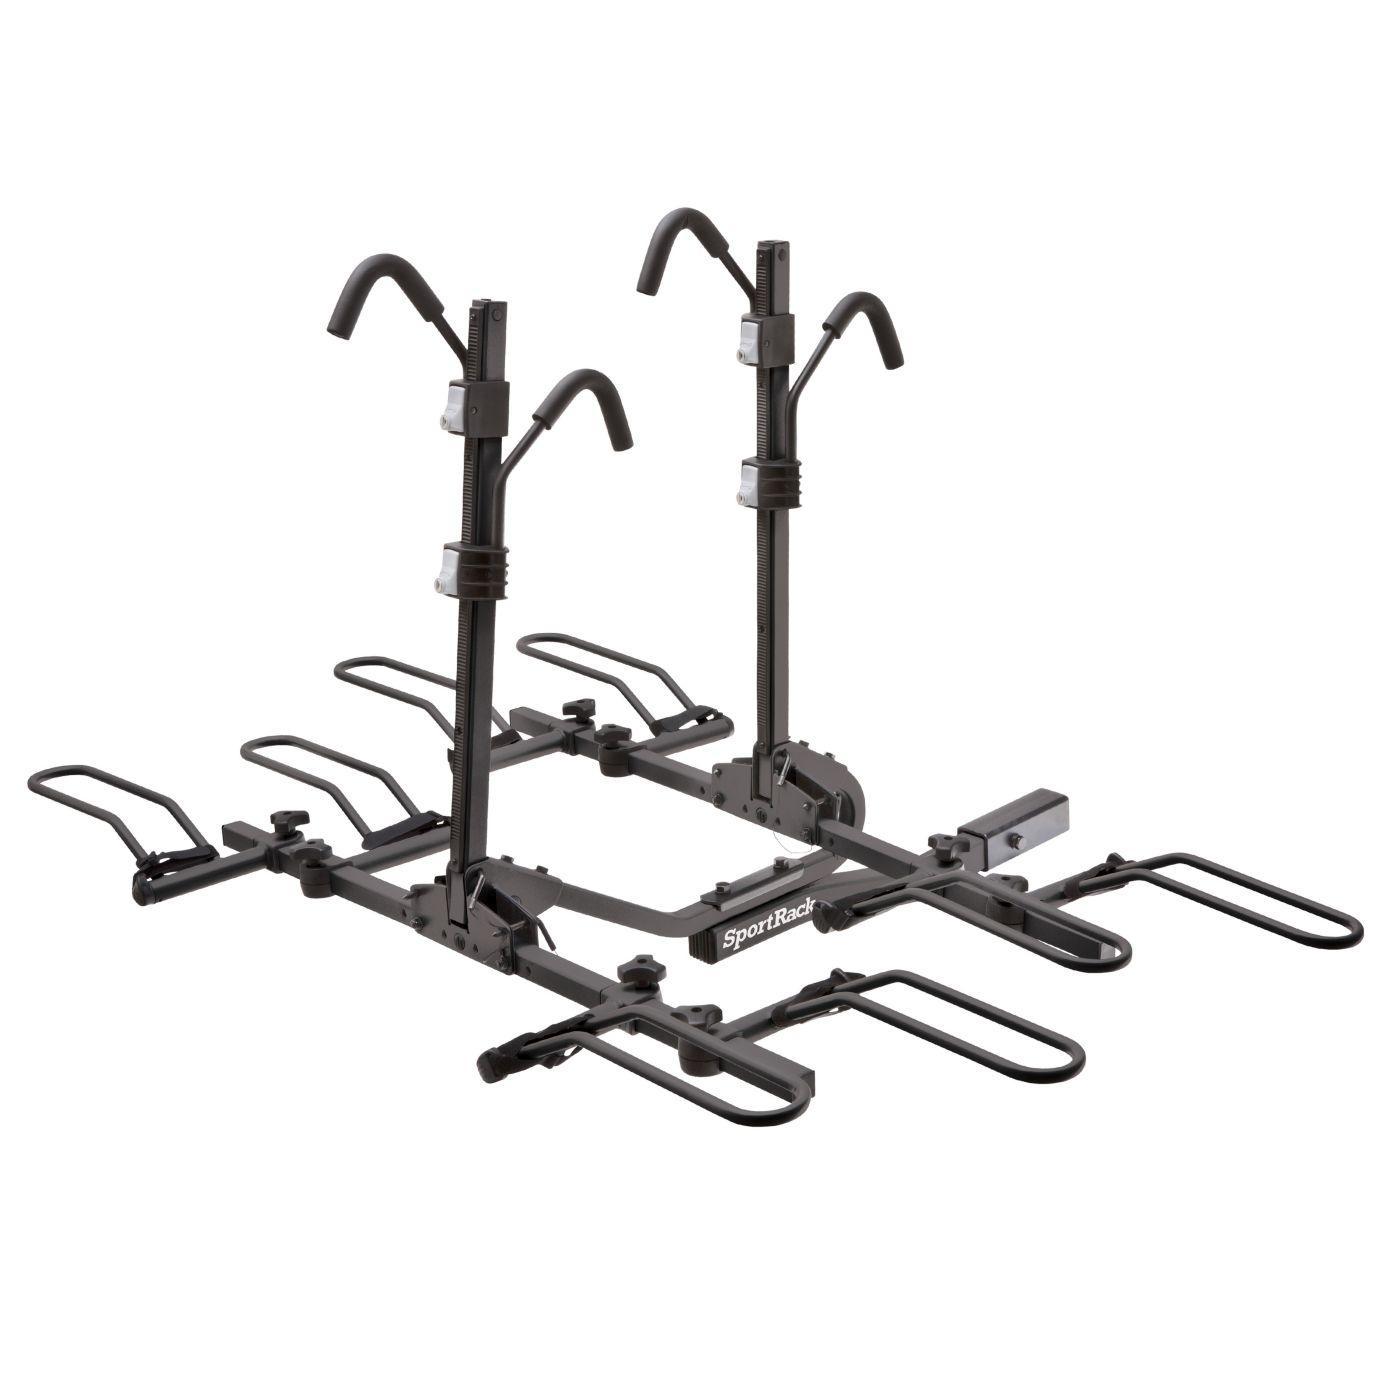 SportRack Crest 4 Deluxe Locking Hitch Mount 4-Bike Rack